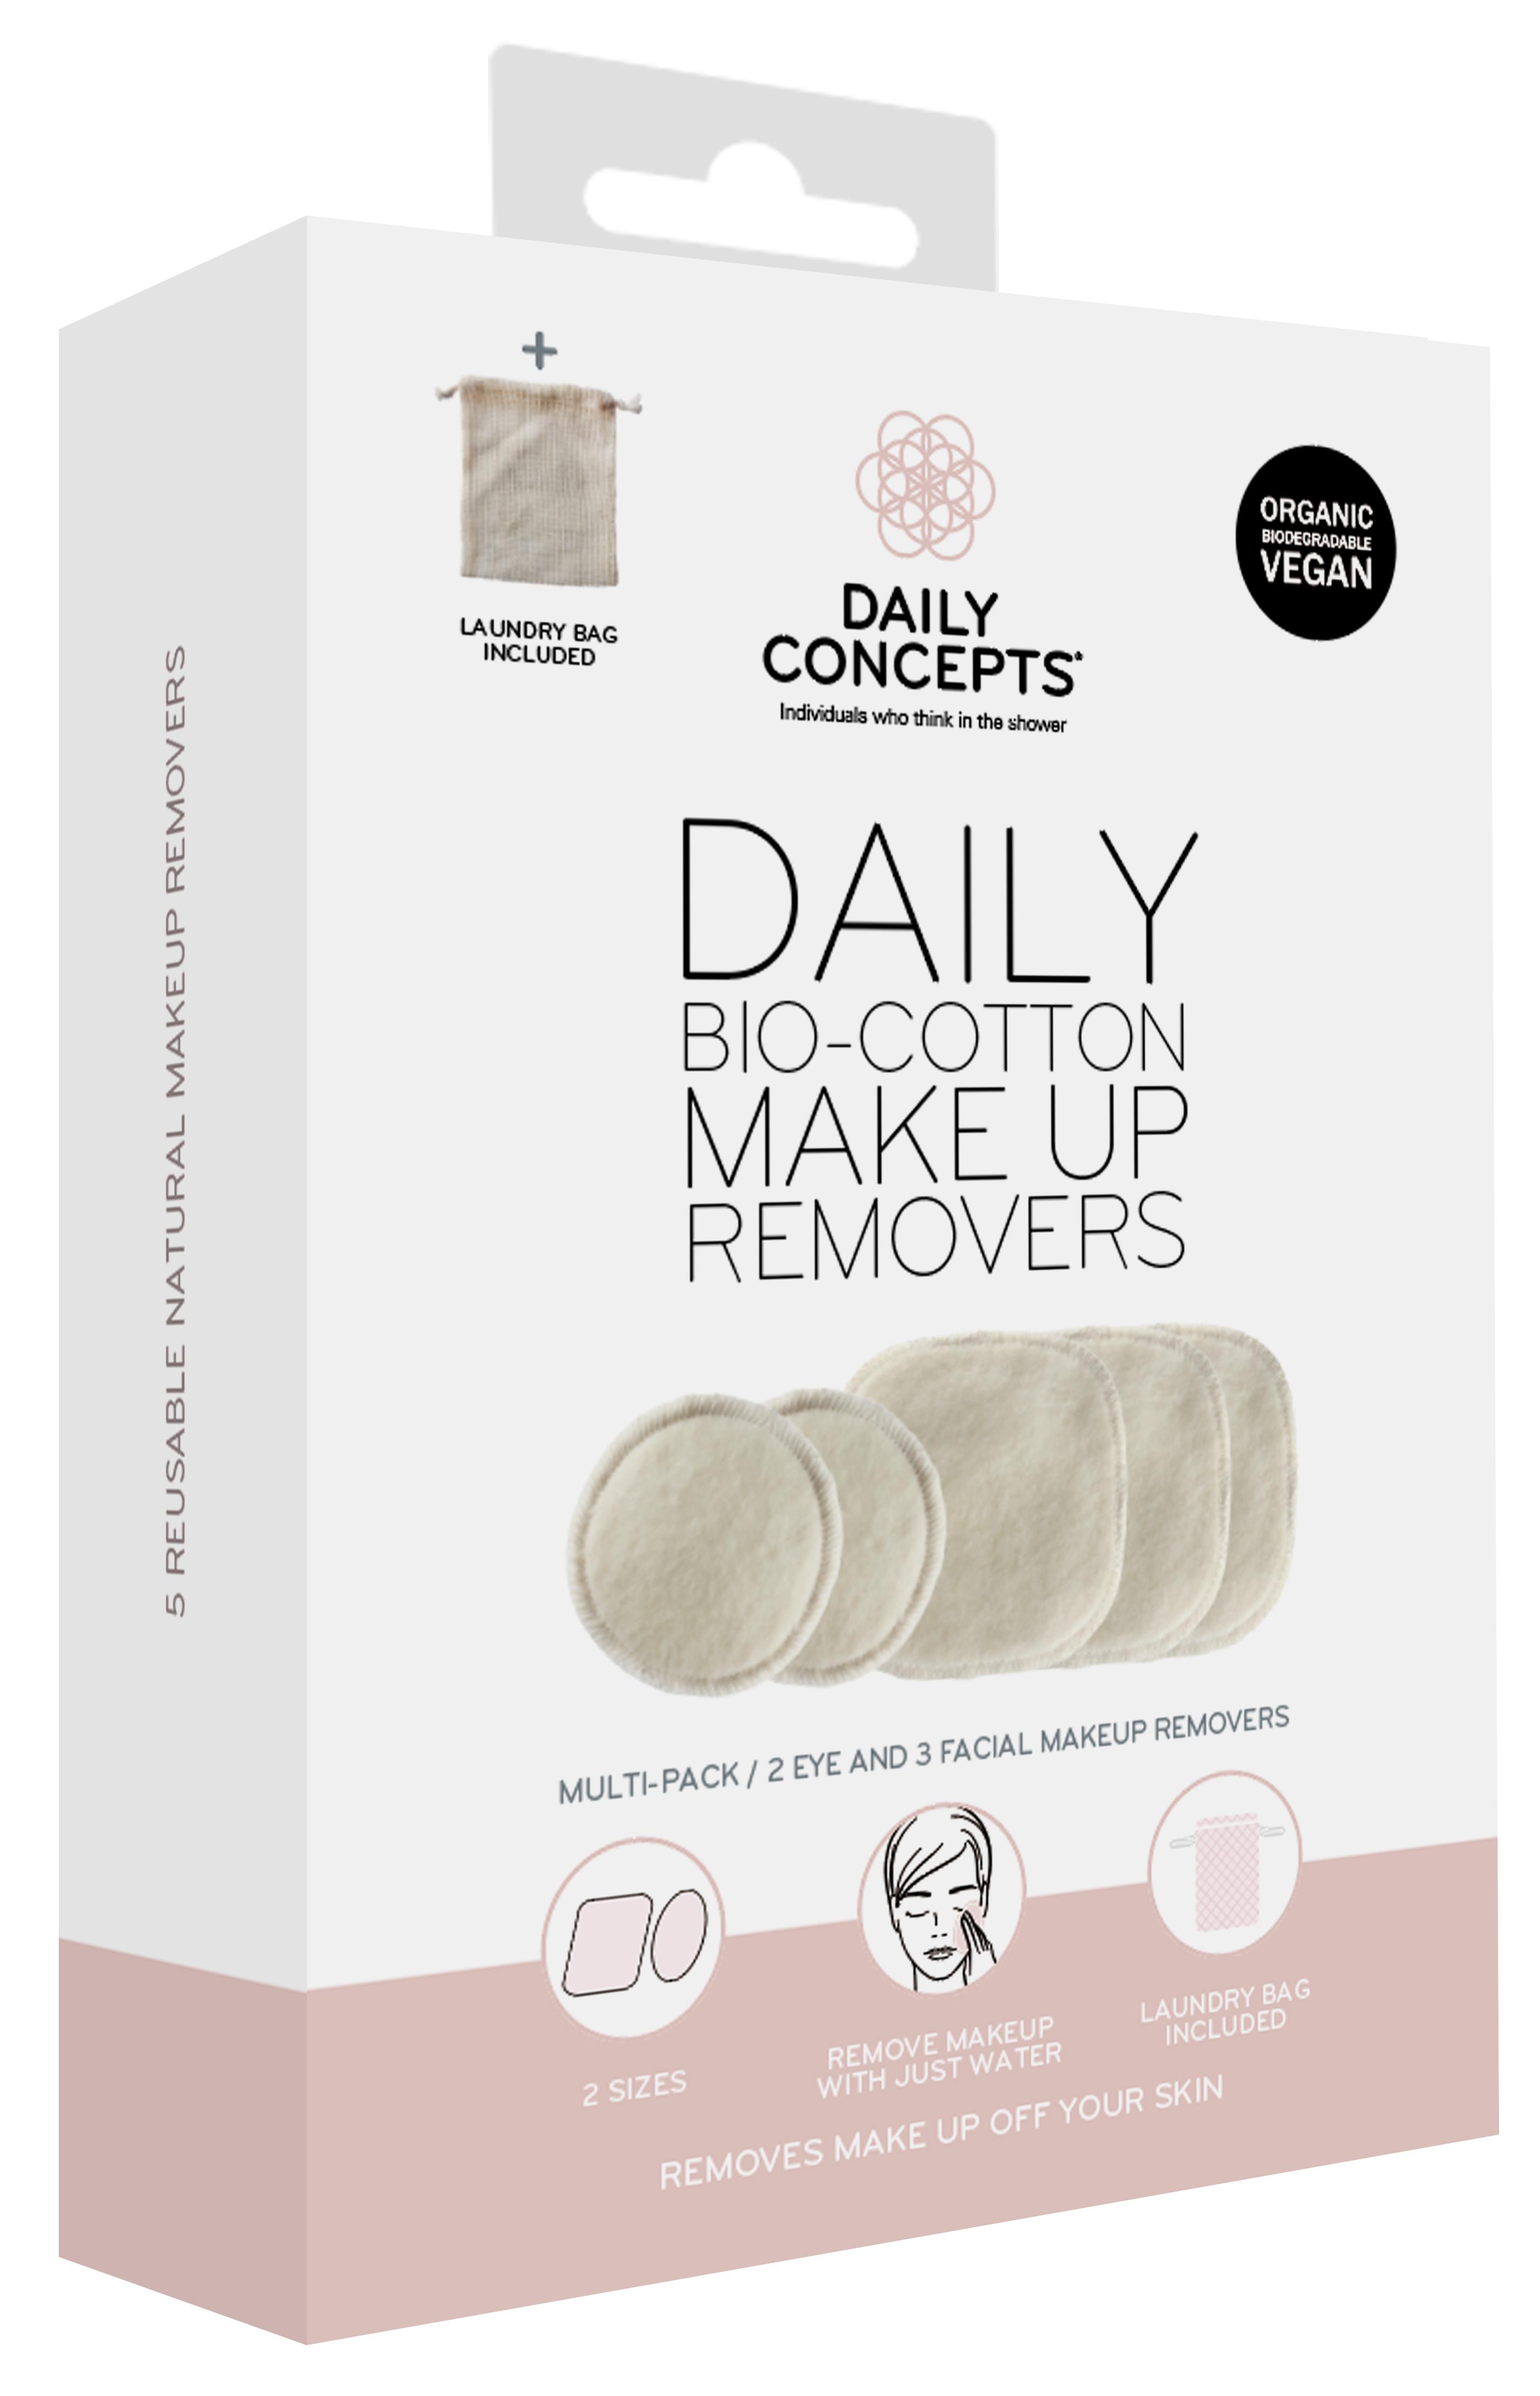 BioCotton Makeup Removers.